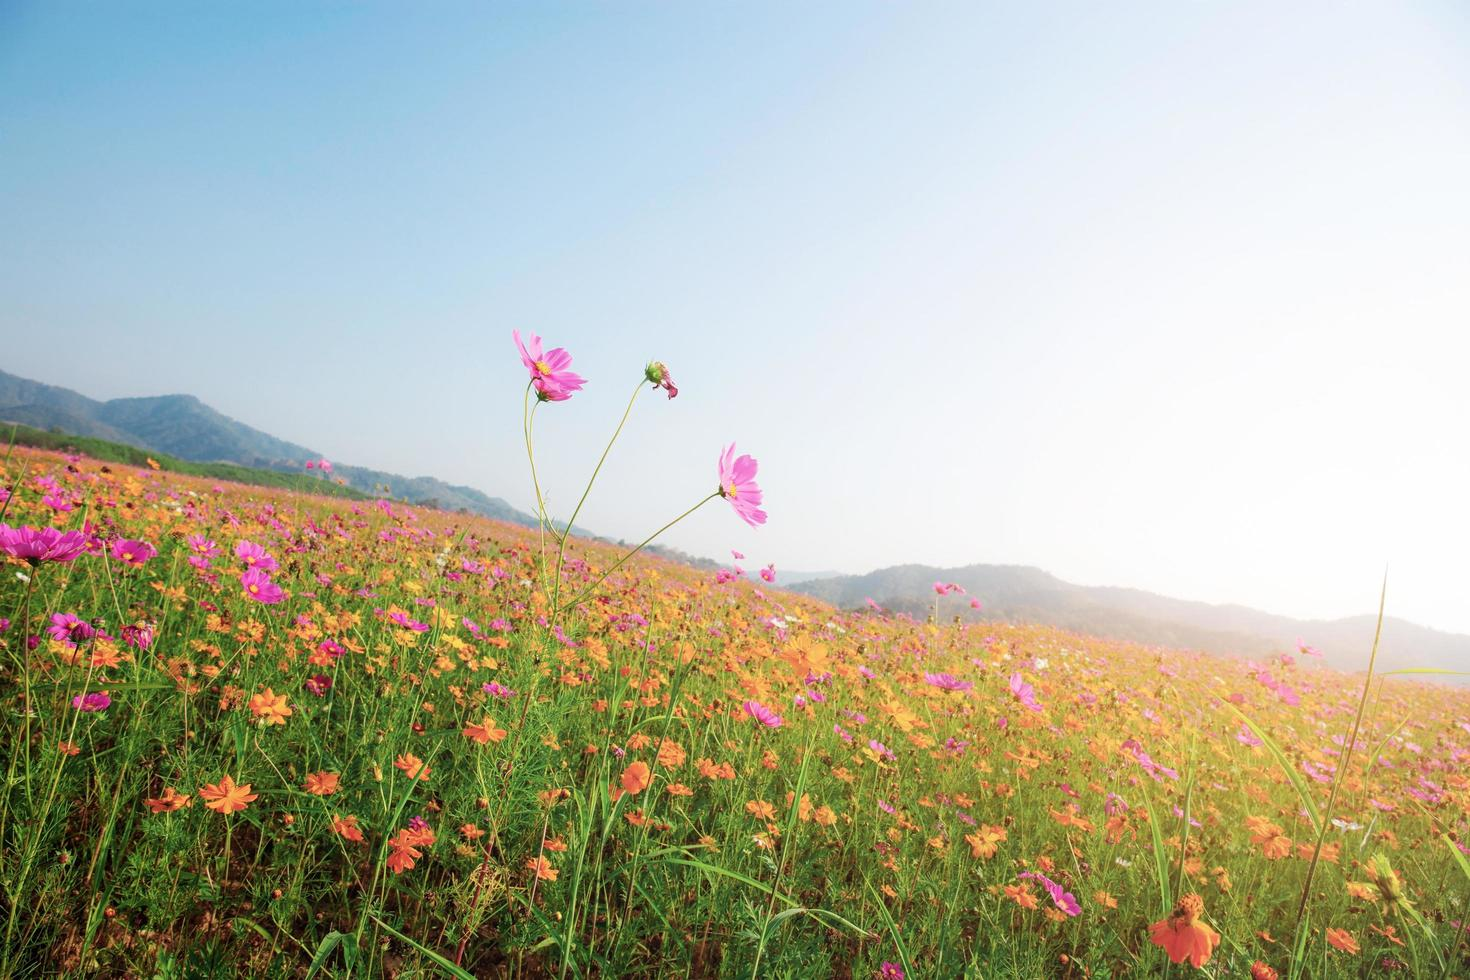 Cosmos flowers in sunlight photo